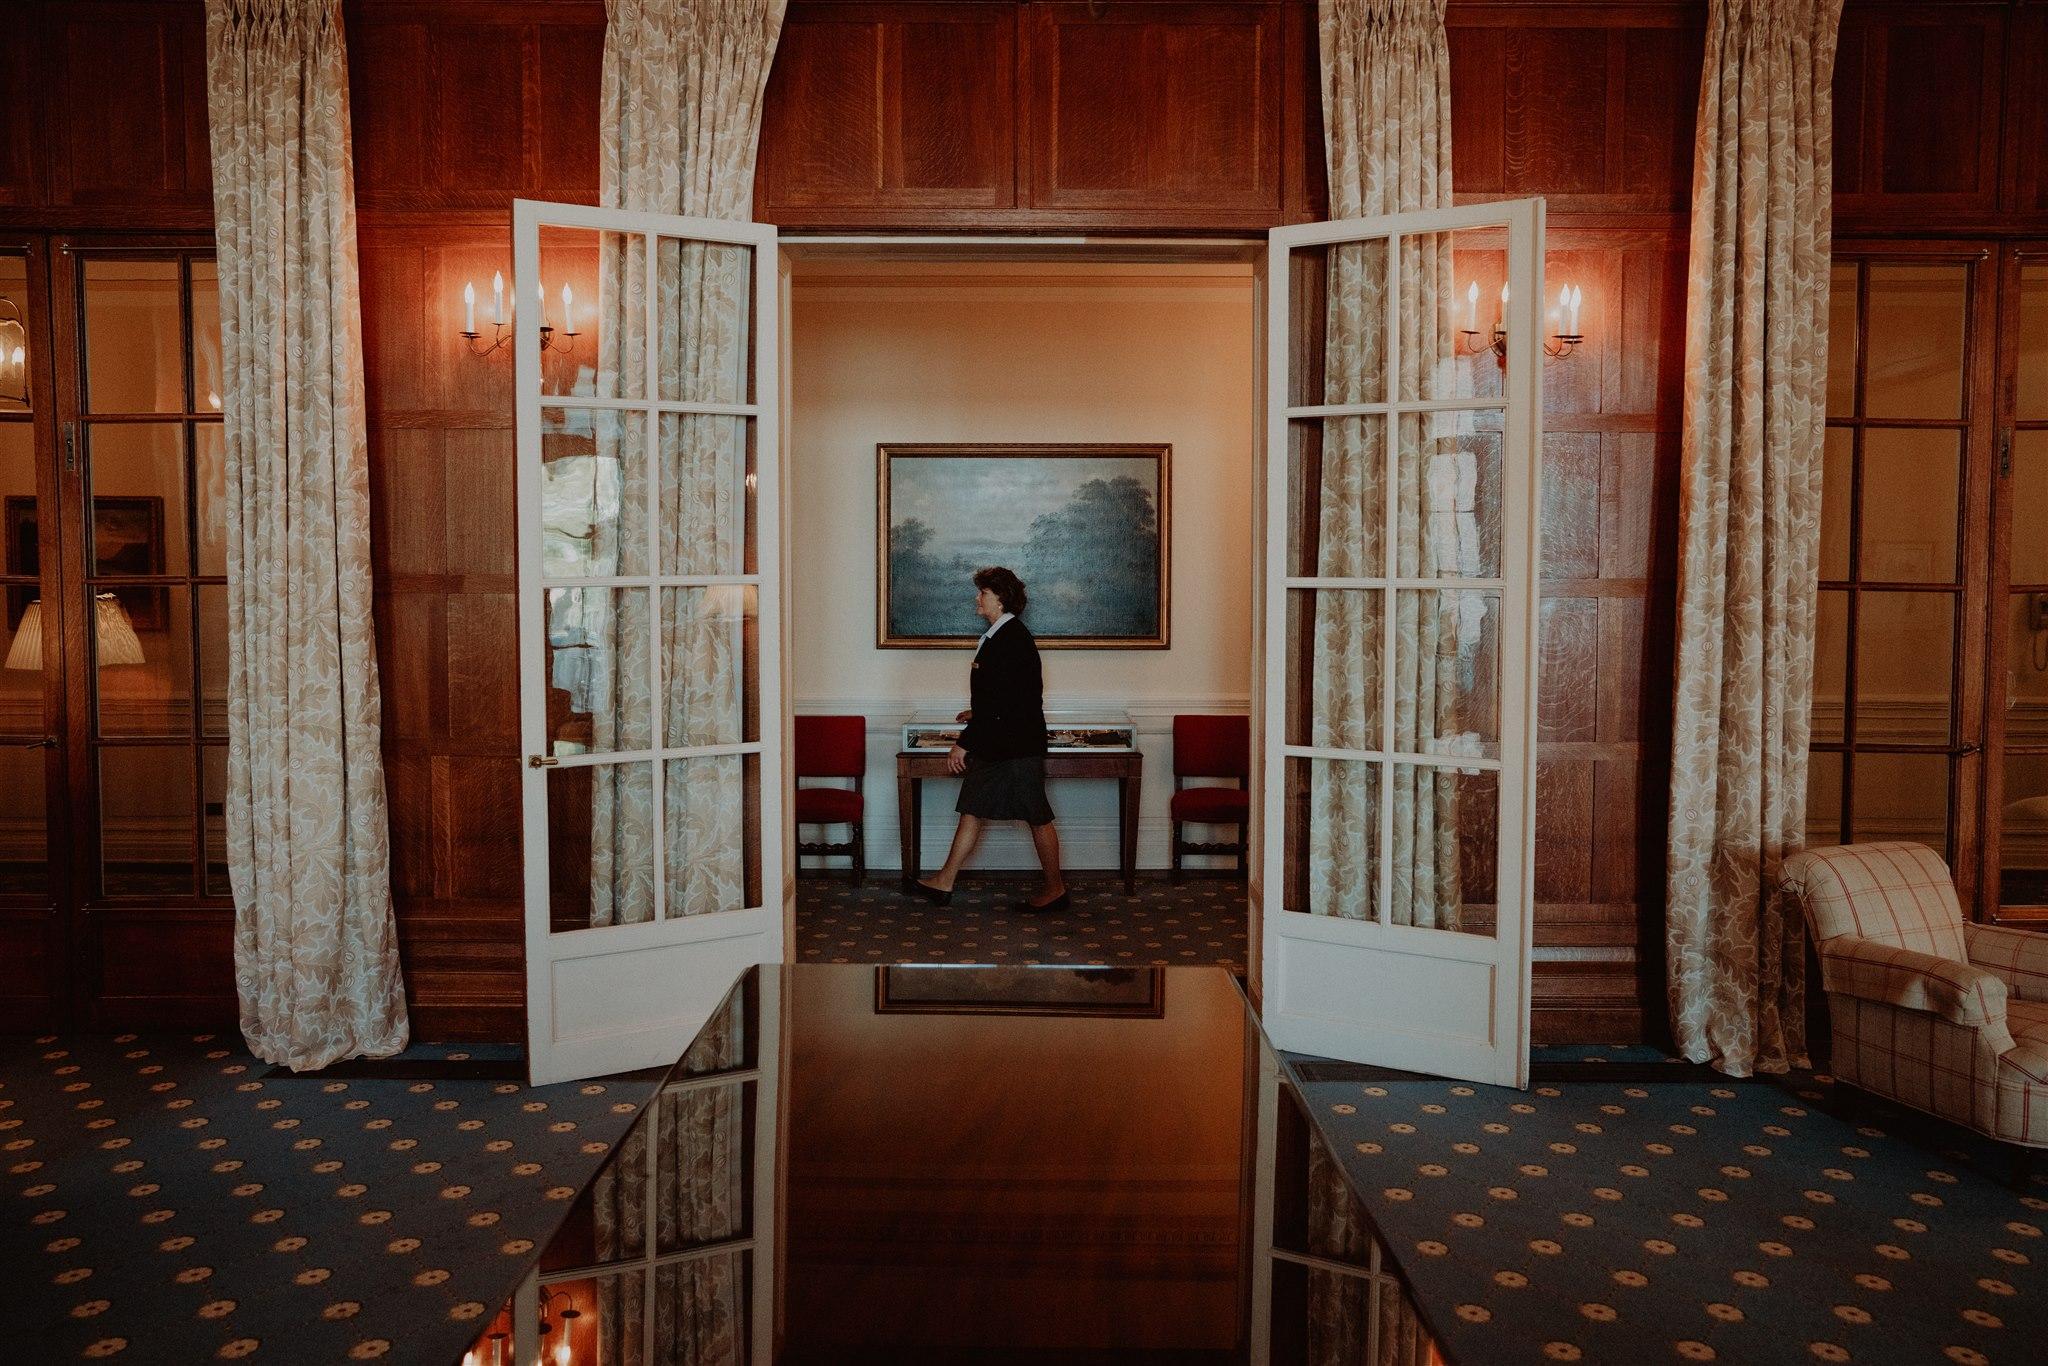 Chellise_Michael_Photography_Hudson_Valley_Wedding_Photographer_Otesaga_Hotel-2033.jpg